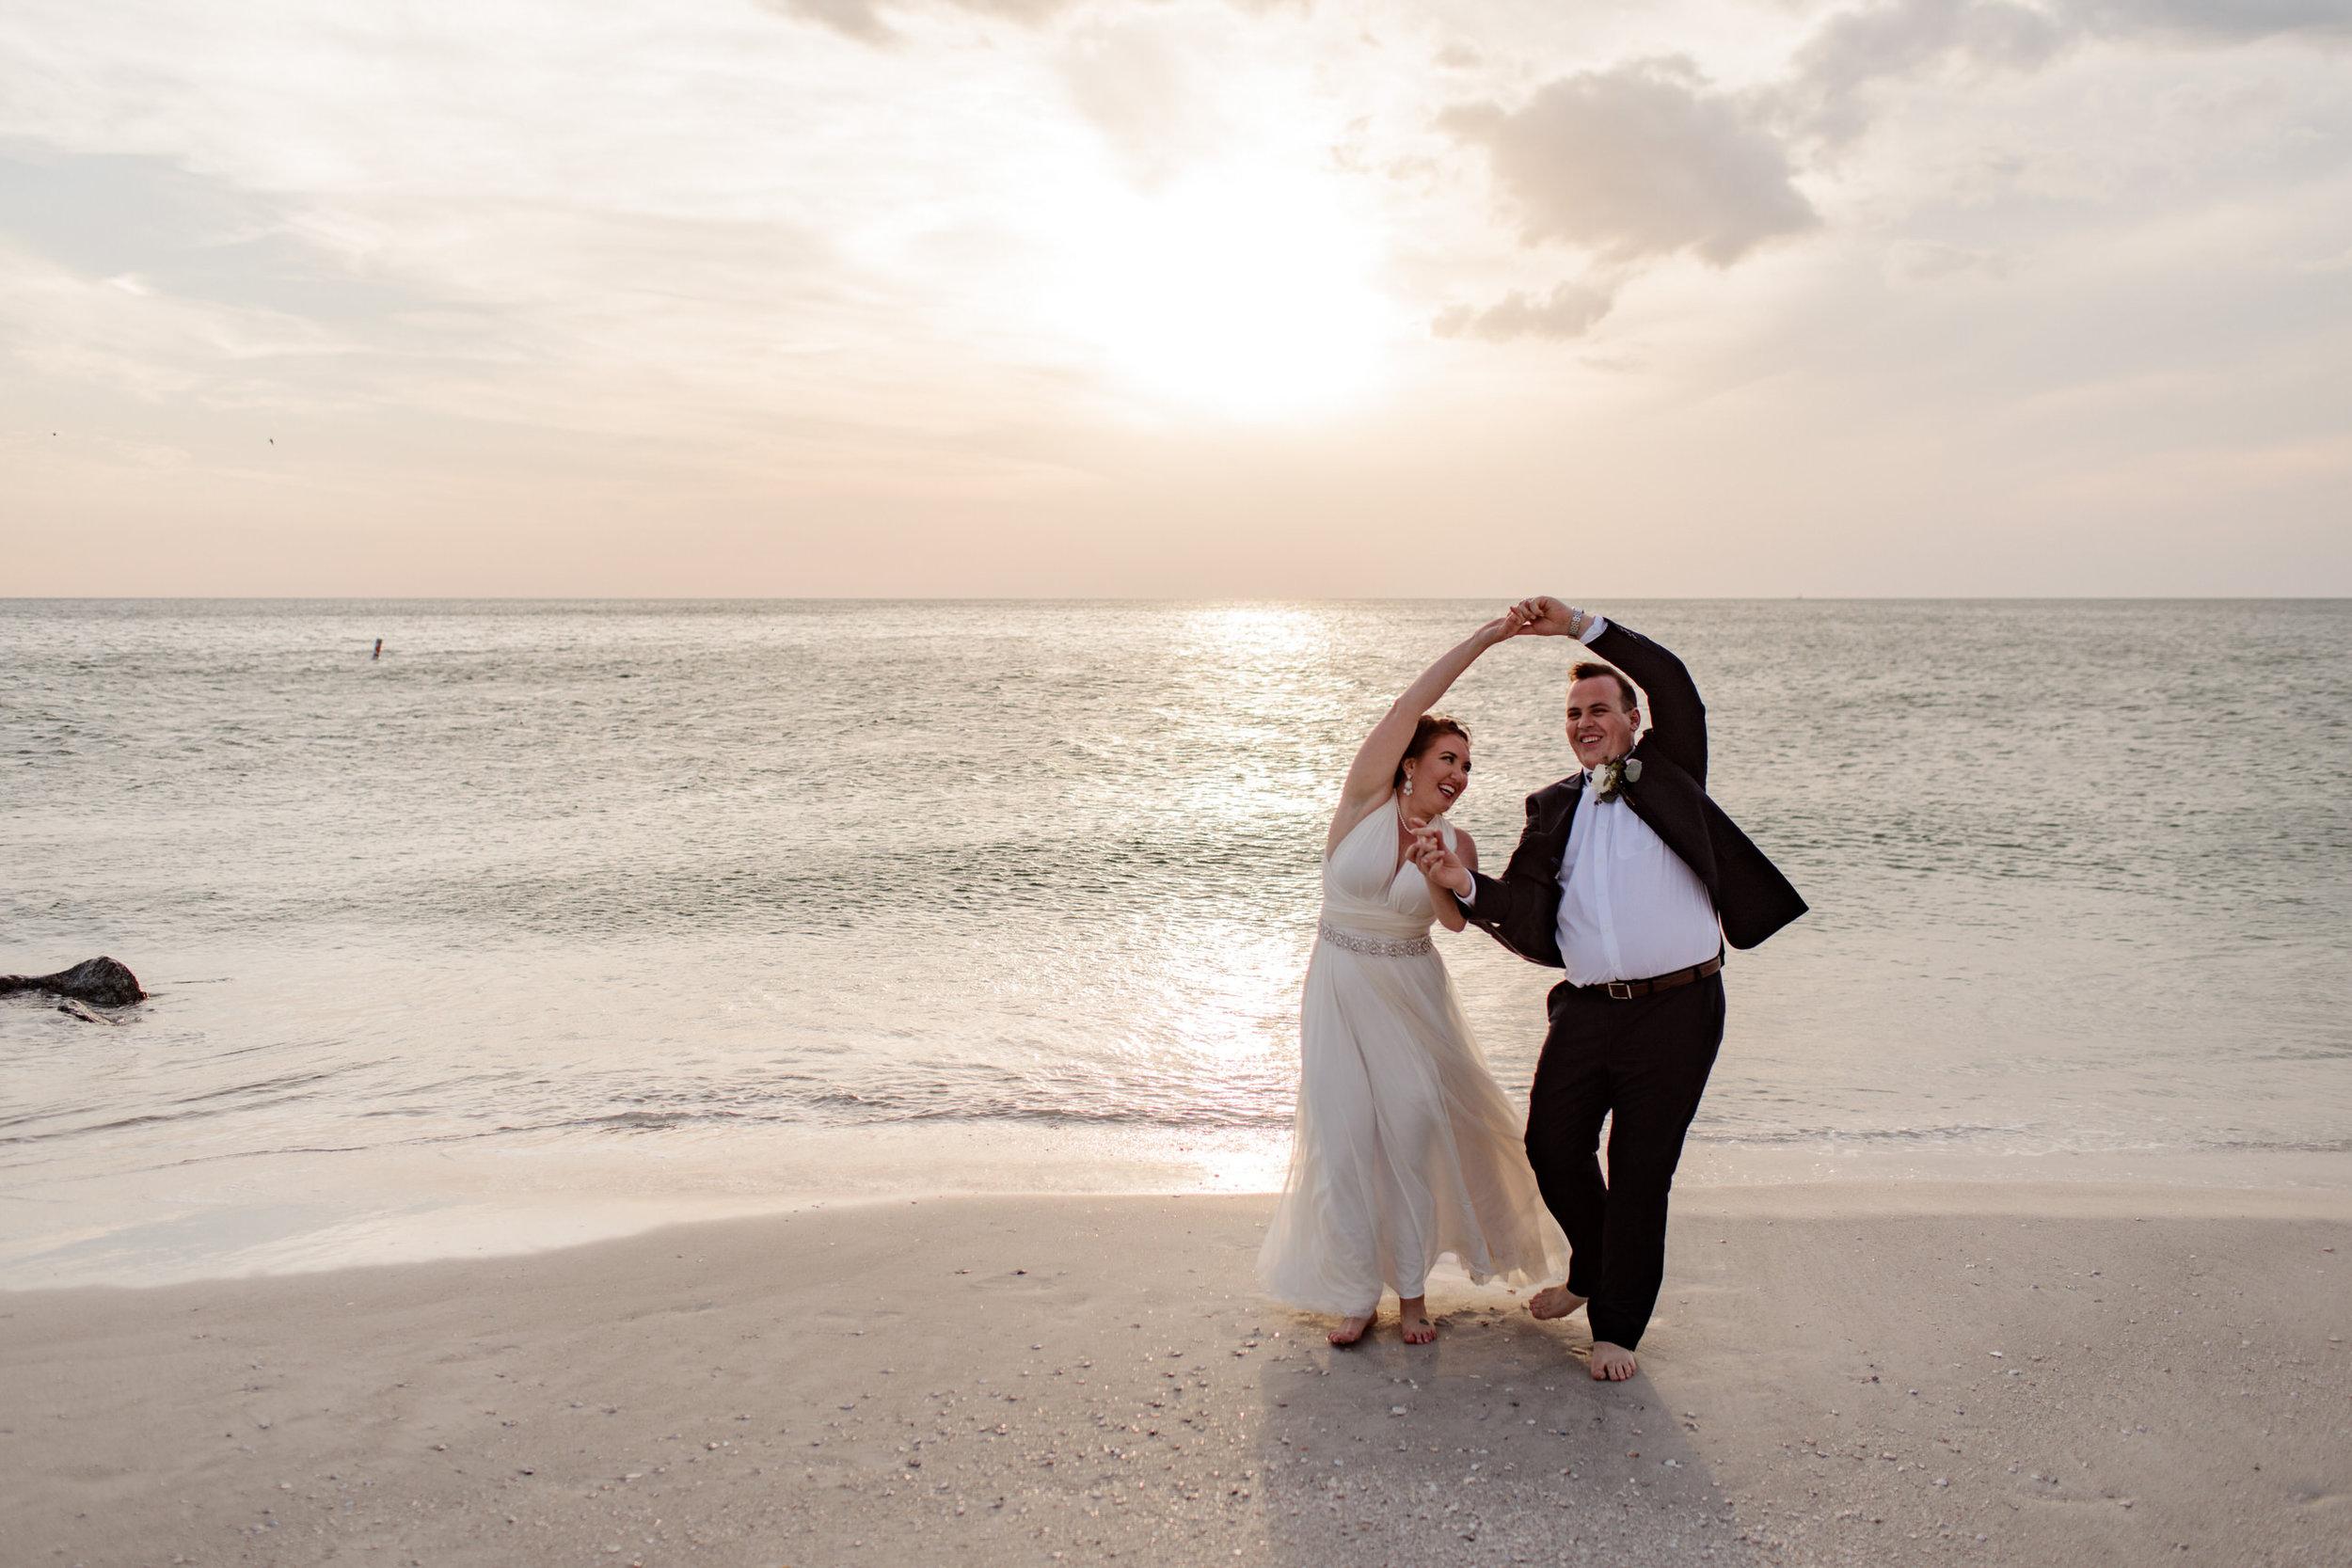 Beltran_Treasure_Island_Elopement_Tampa_Wedding_132-1.jpg